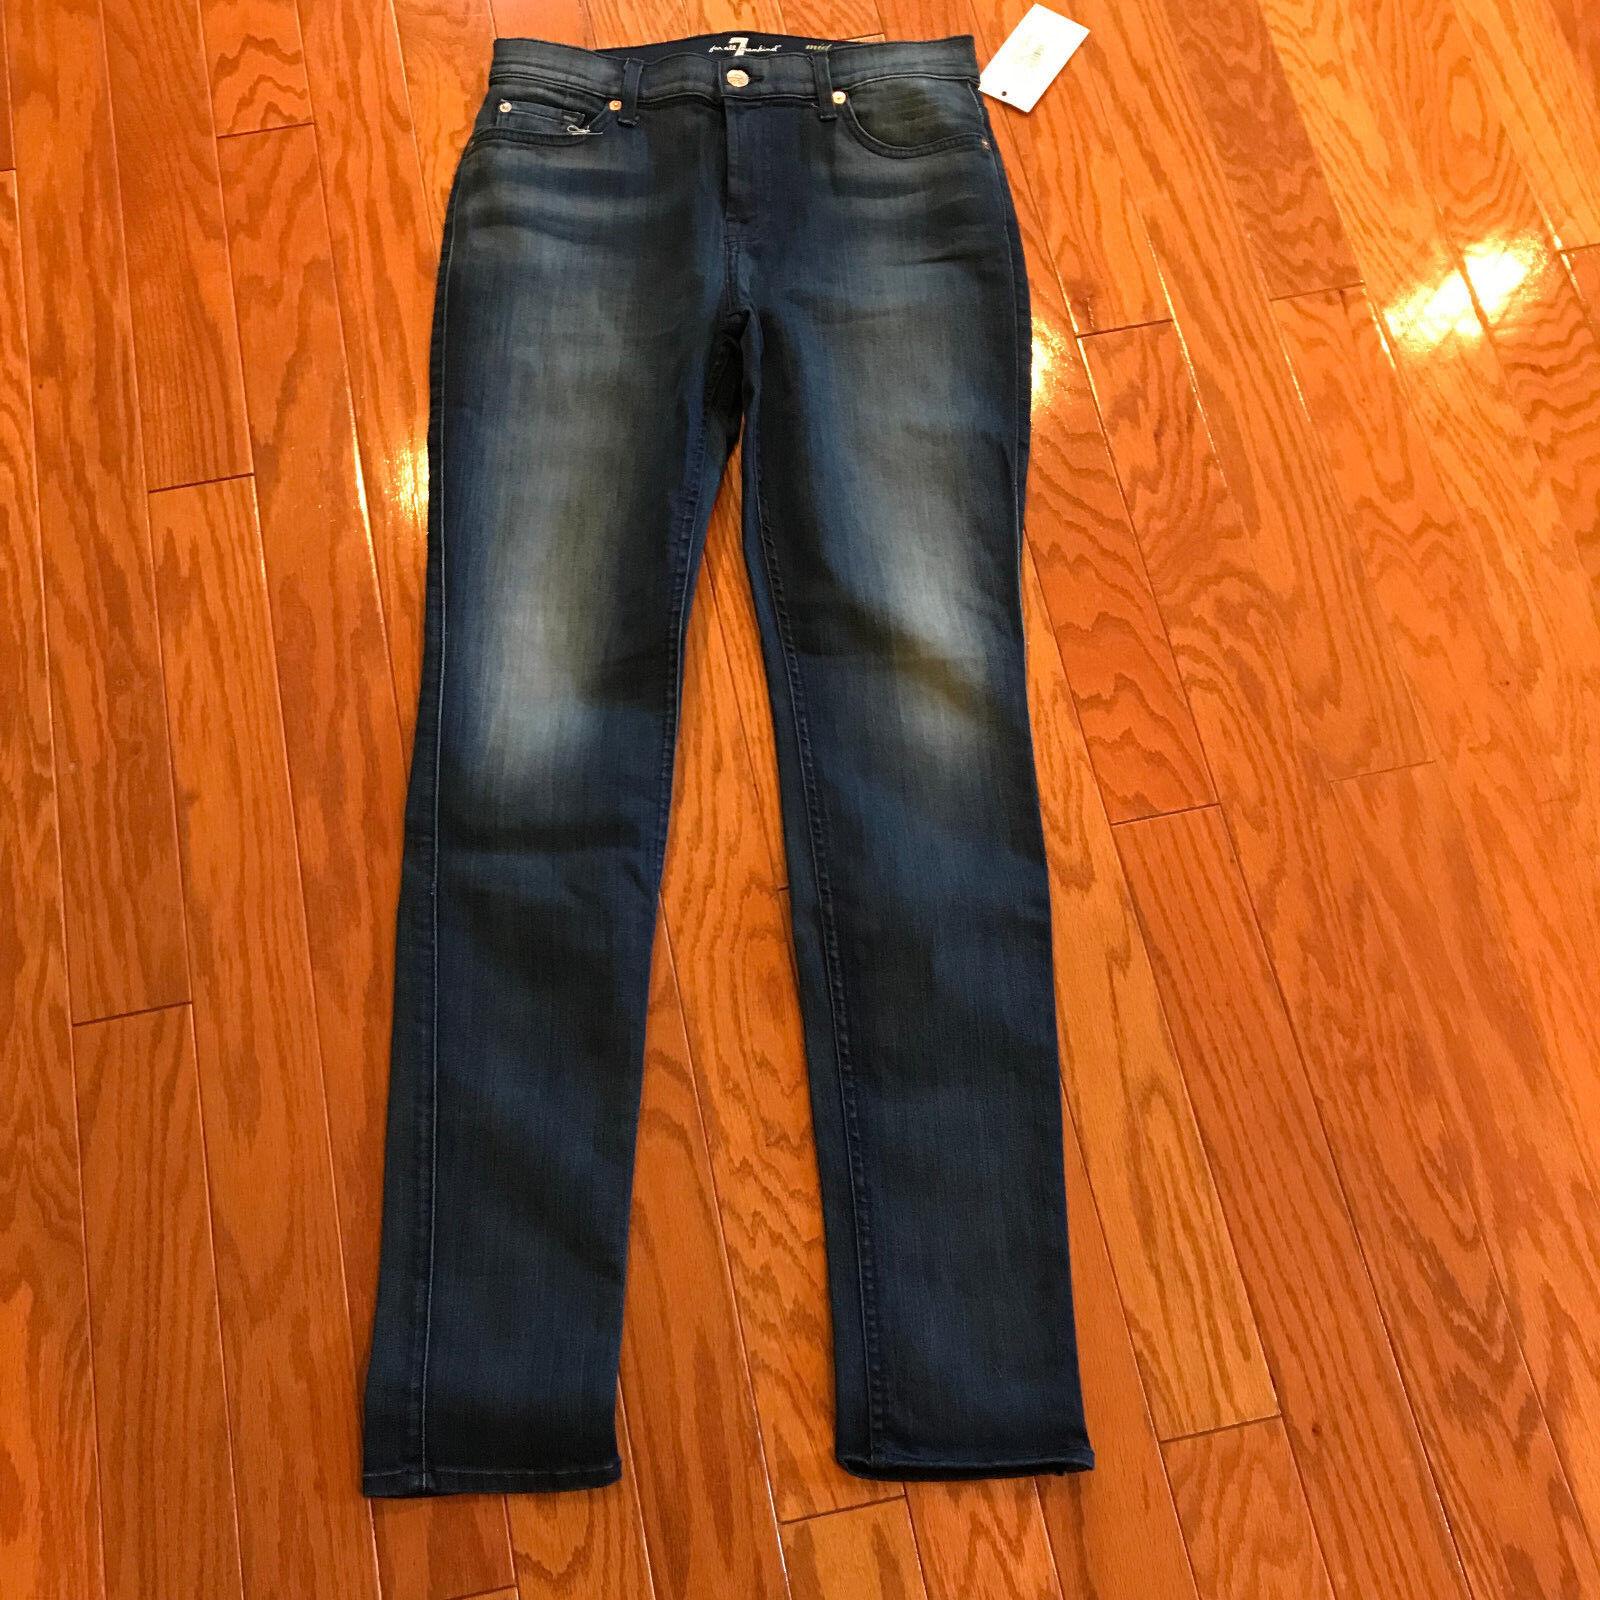 NWT 7 for All Mankind Roxanne mid rise medium wash jeans denim pants 30 slim fit